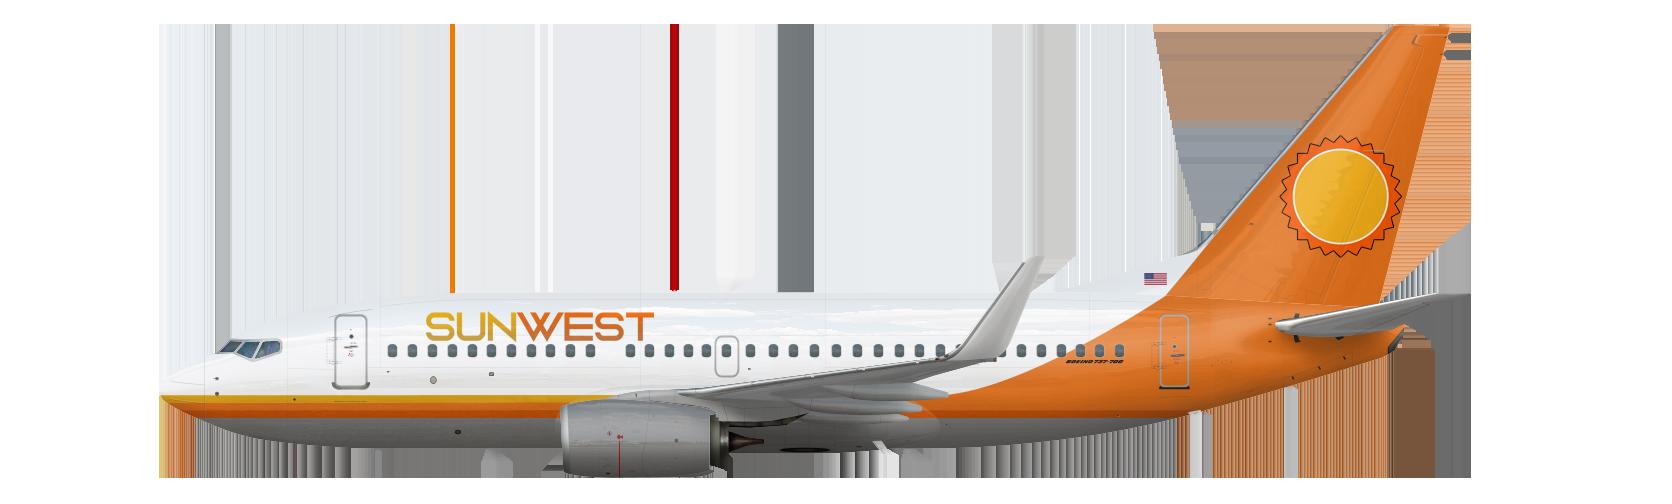 Boeing 737-700 Retro Livery